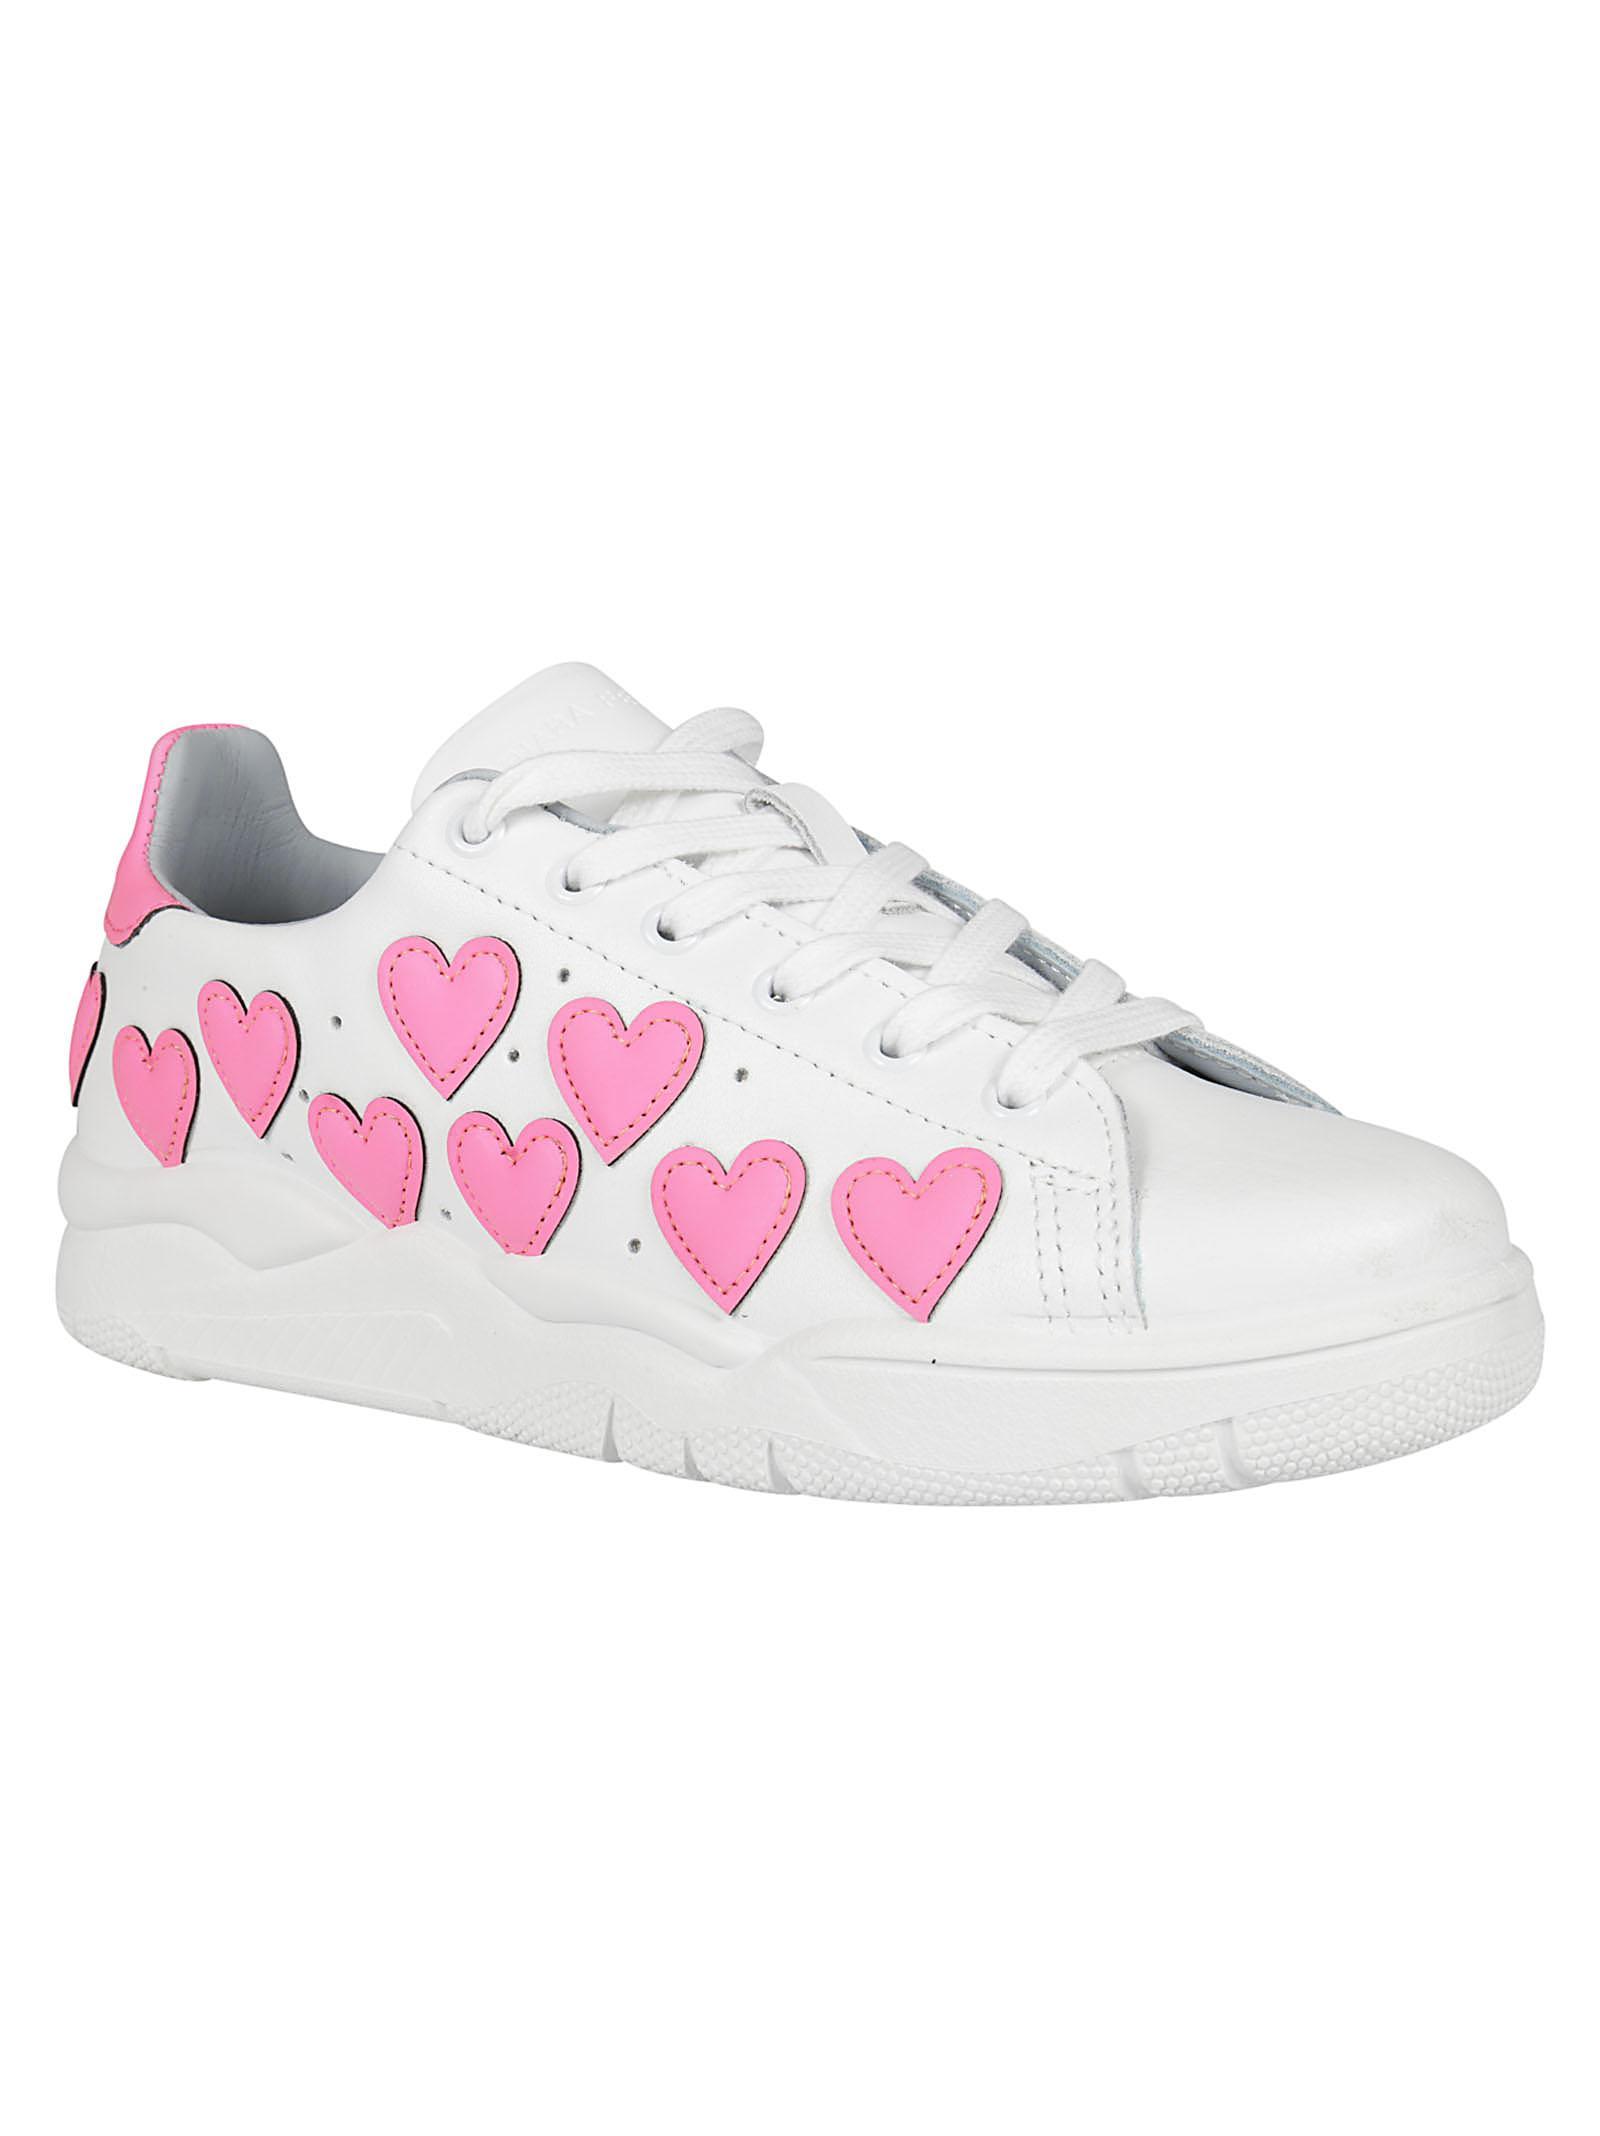 Chiara Ferragni Leather Hearts Sneaker